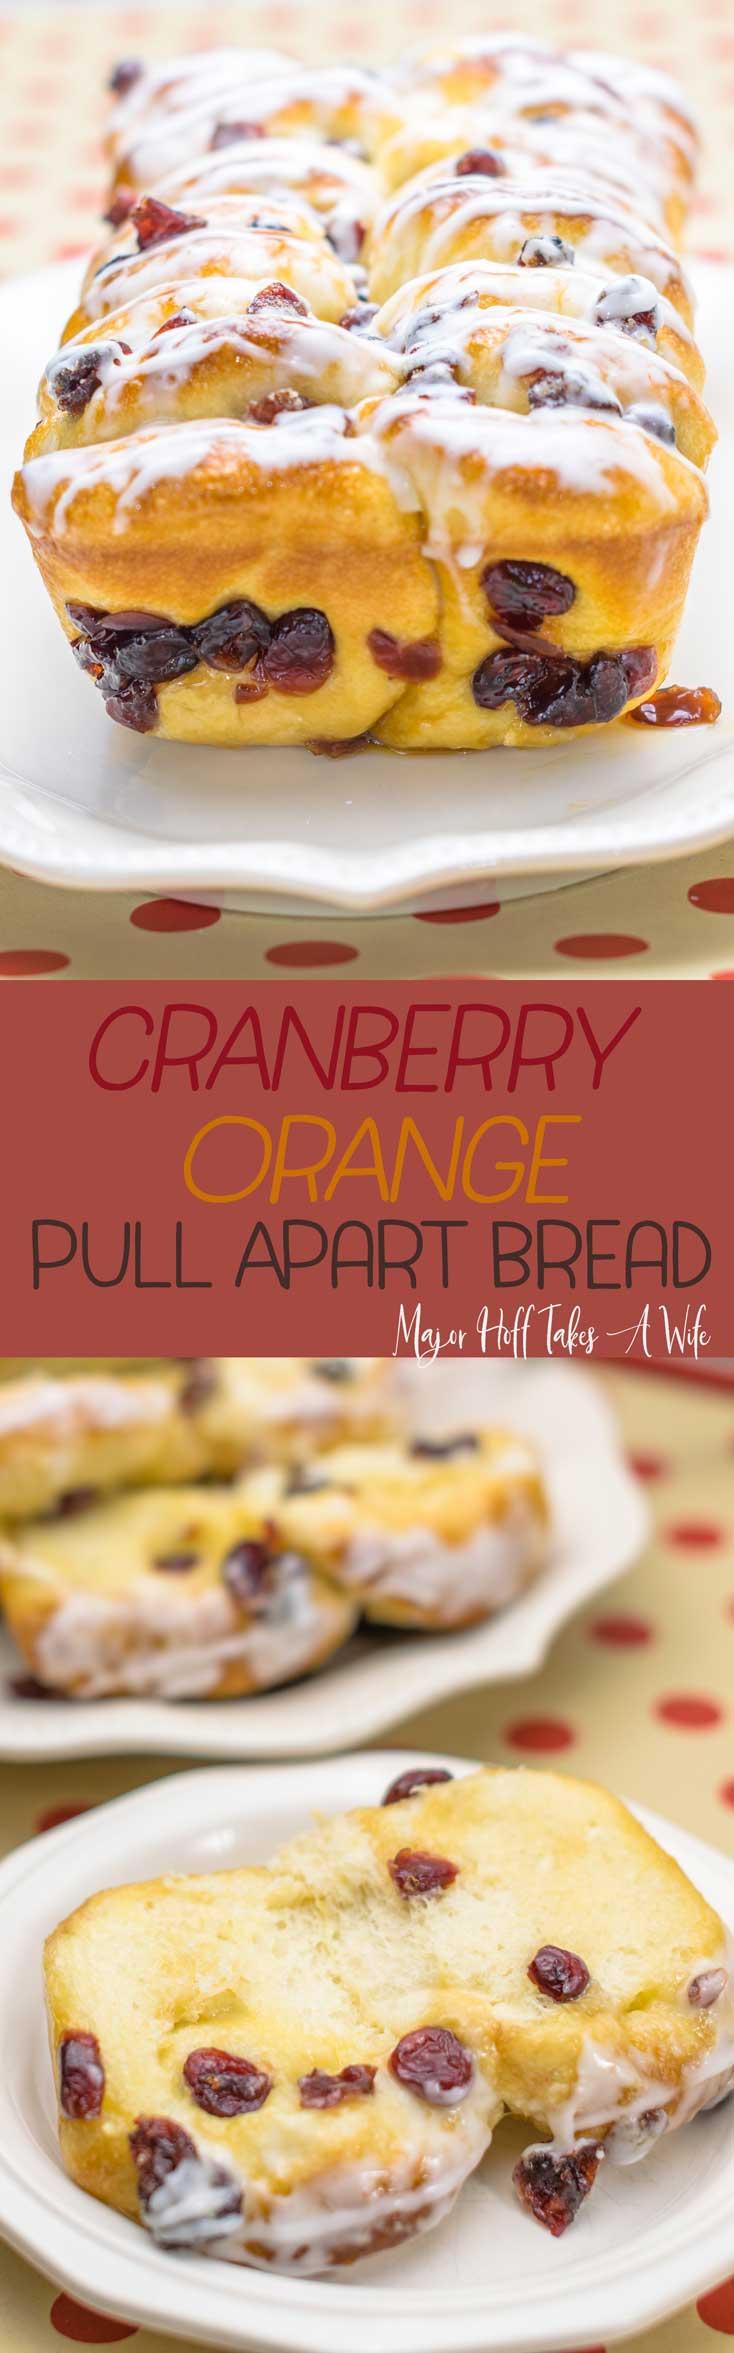 Pull apart cranberry orange bread! This easy to make dessert bread features frozen yeast rolls, brown sugar, orange juice and dried cranberries. #cranberry #quickbread #rhodesrolls #cranberrybread via @mrsmajorhoff